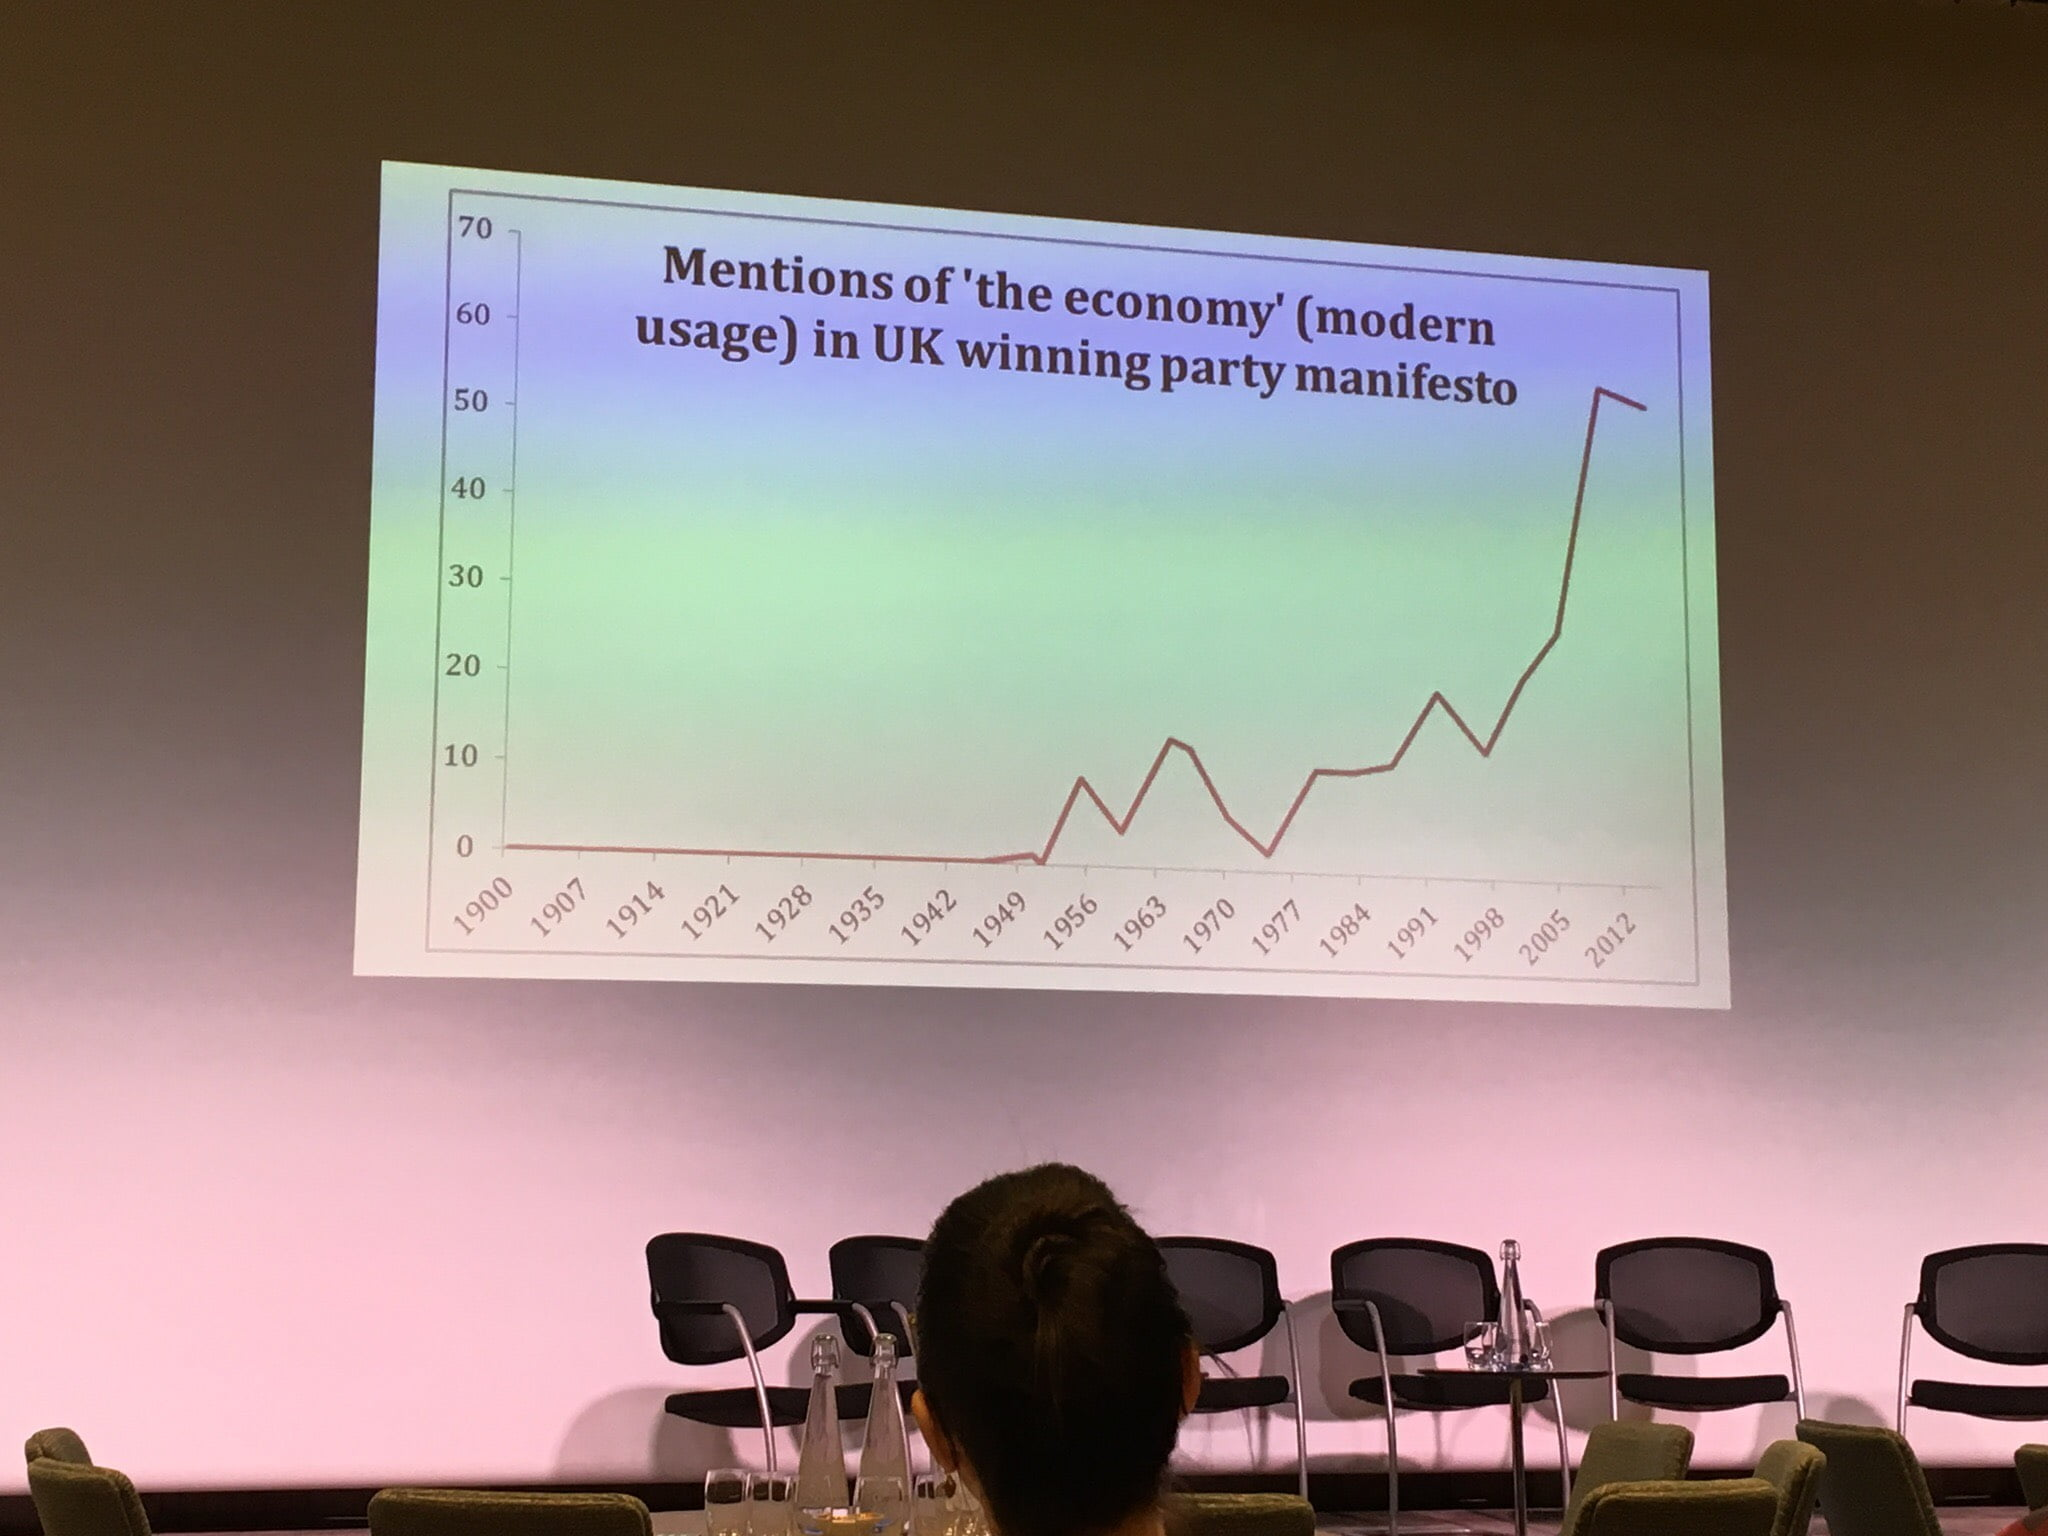 Economic Literacy Summit: Only 12% of people understand economic talk